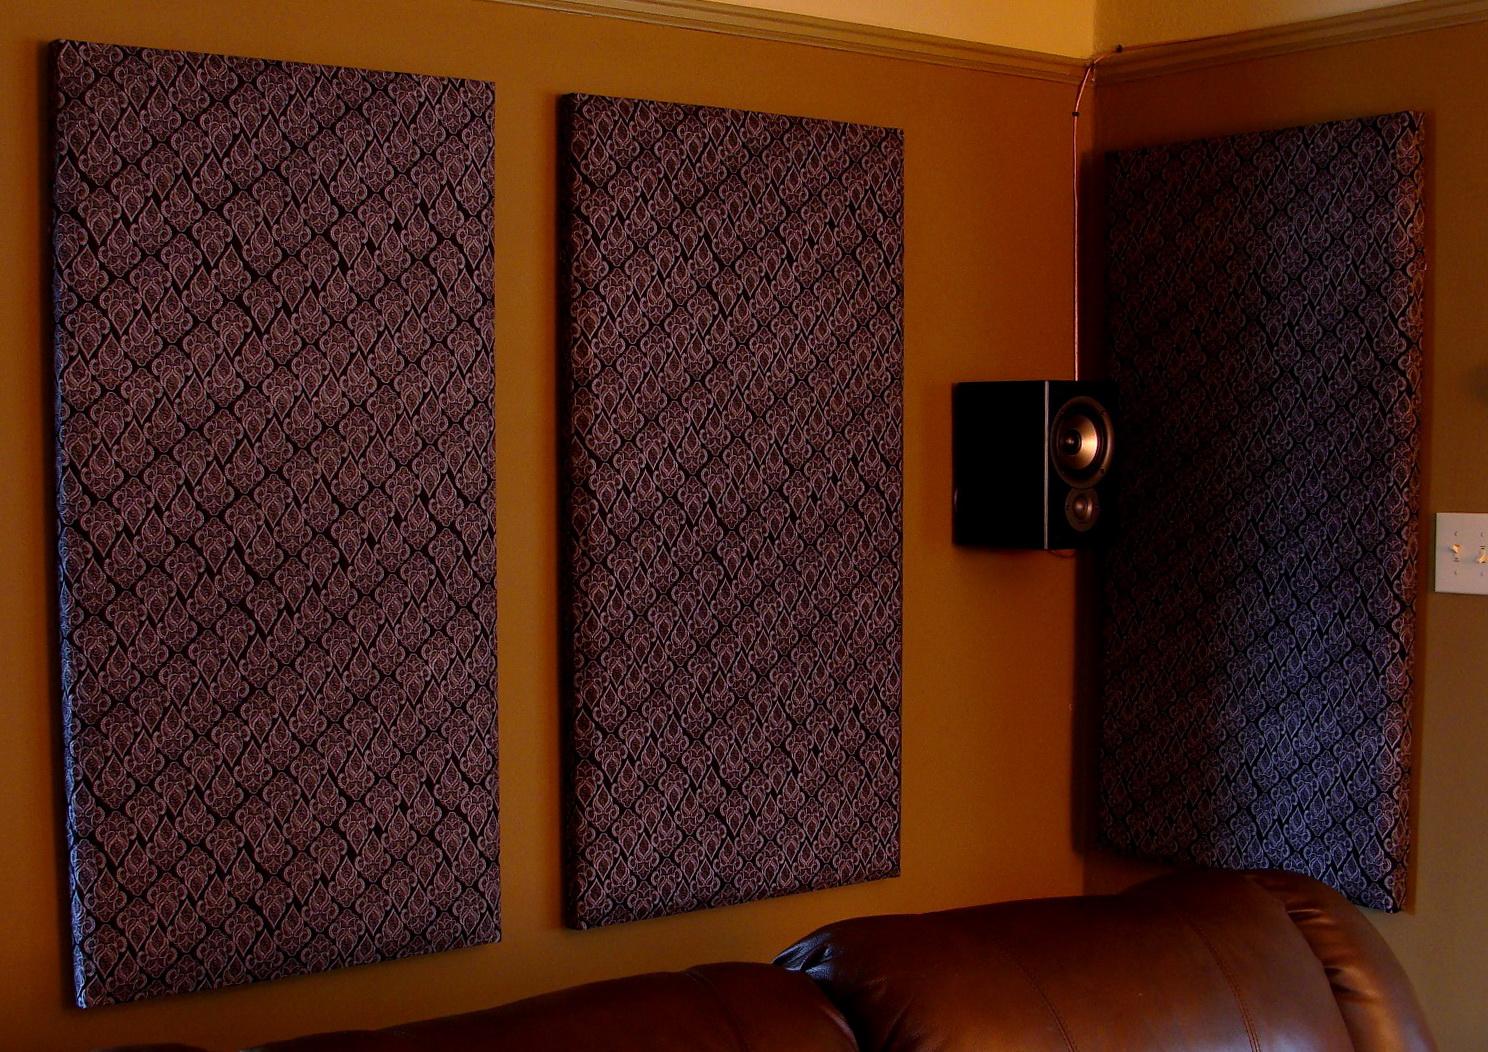 Sound Absorbing Curtains Diy | Home Design Ideas